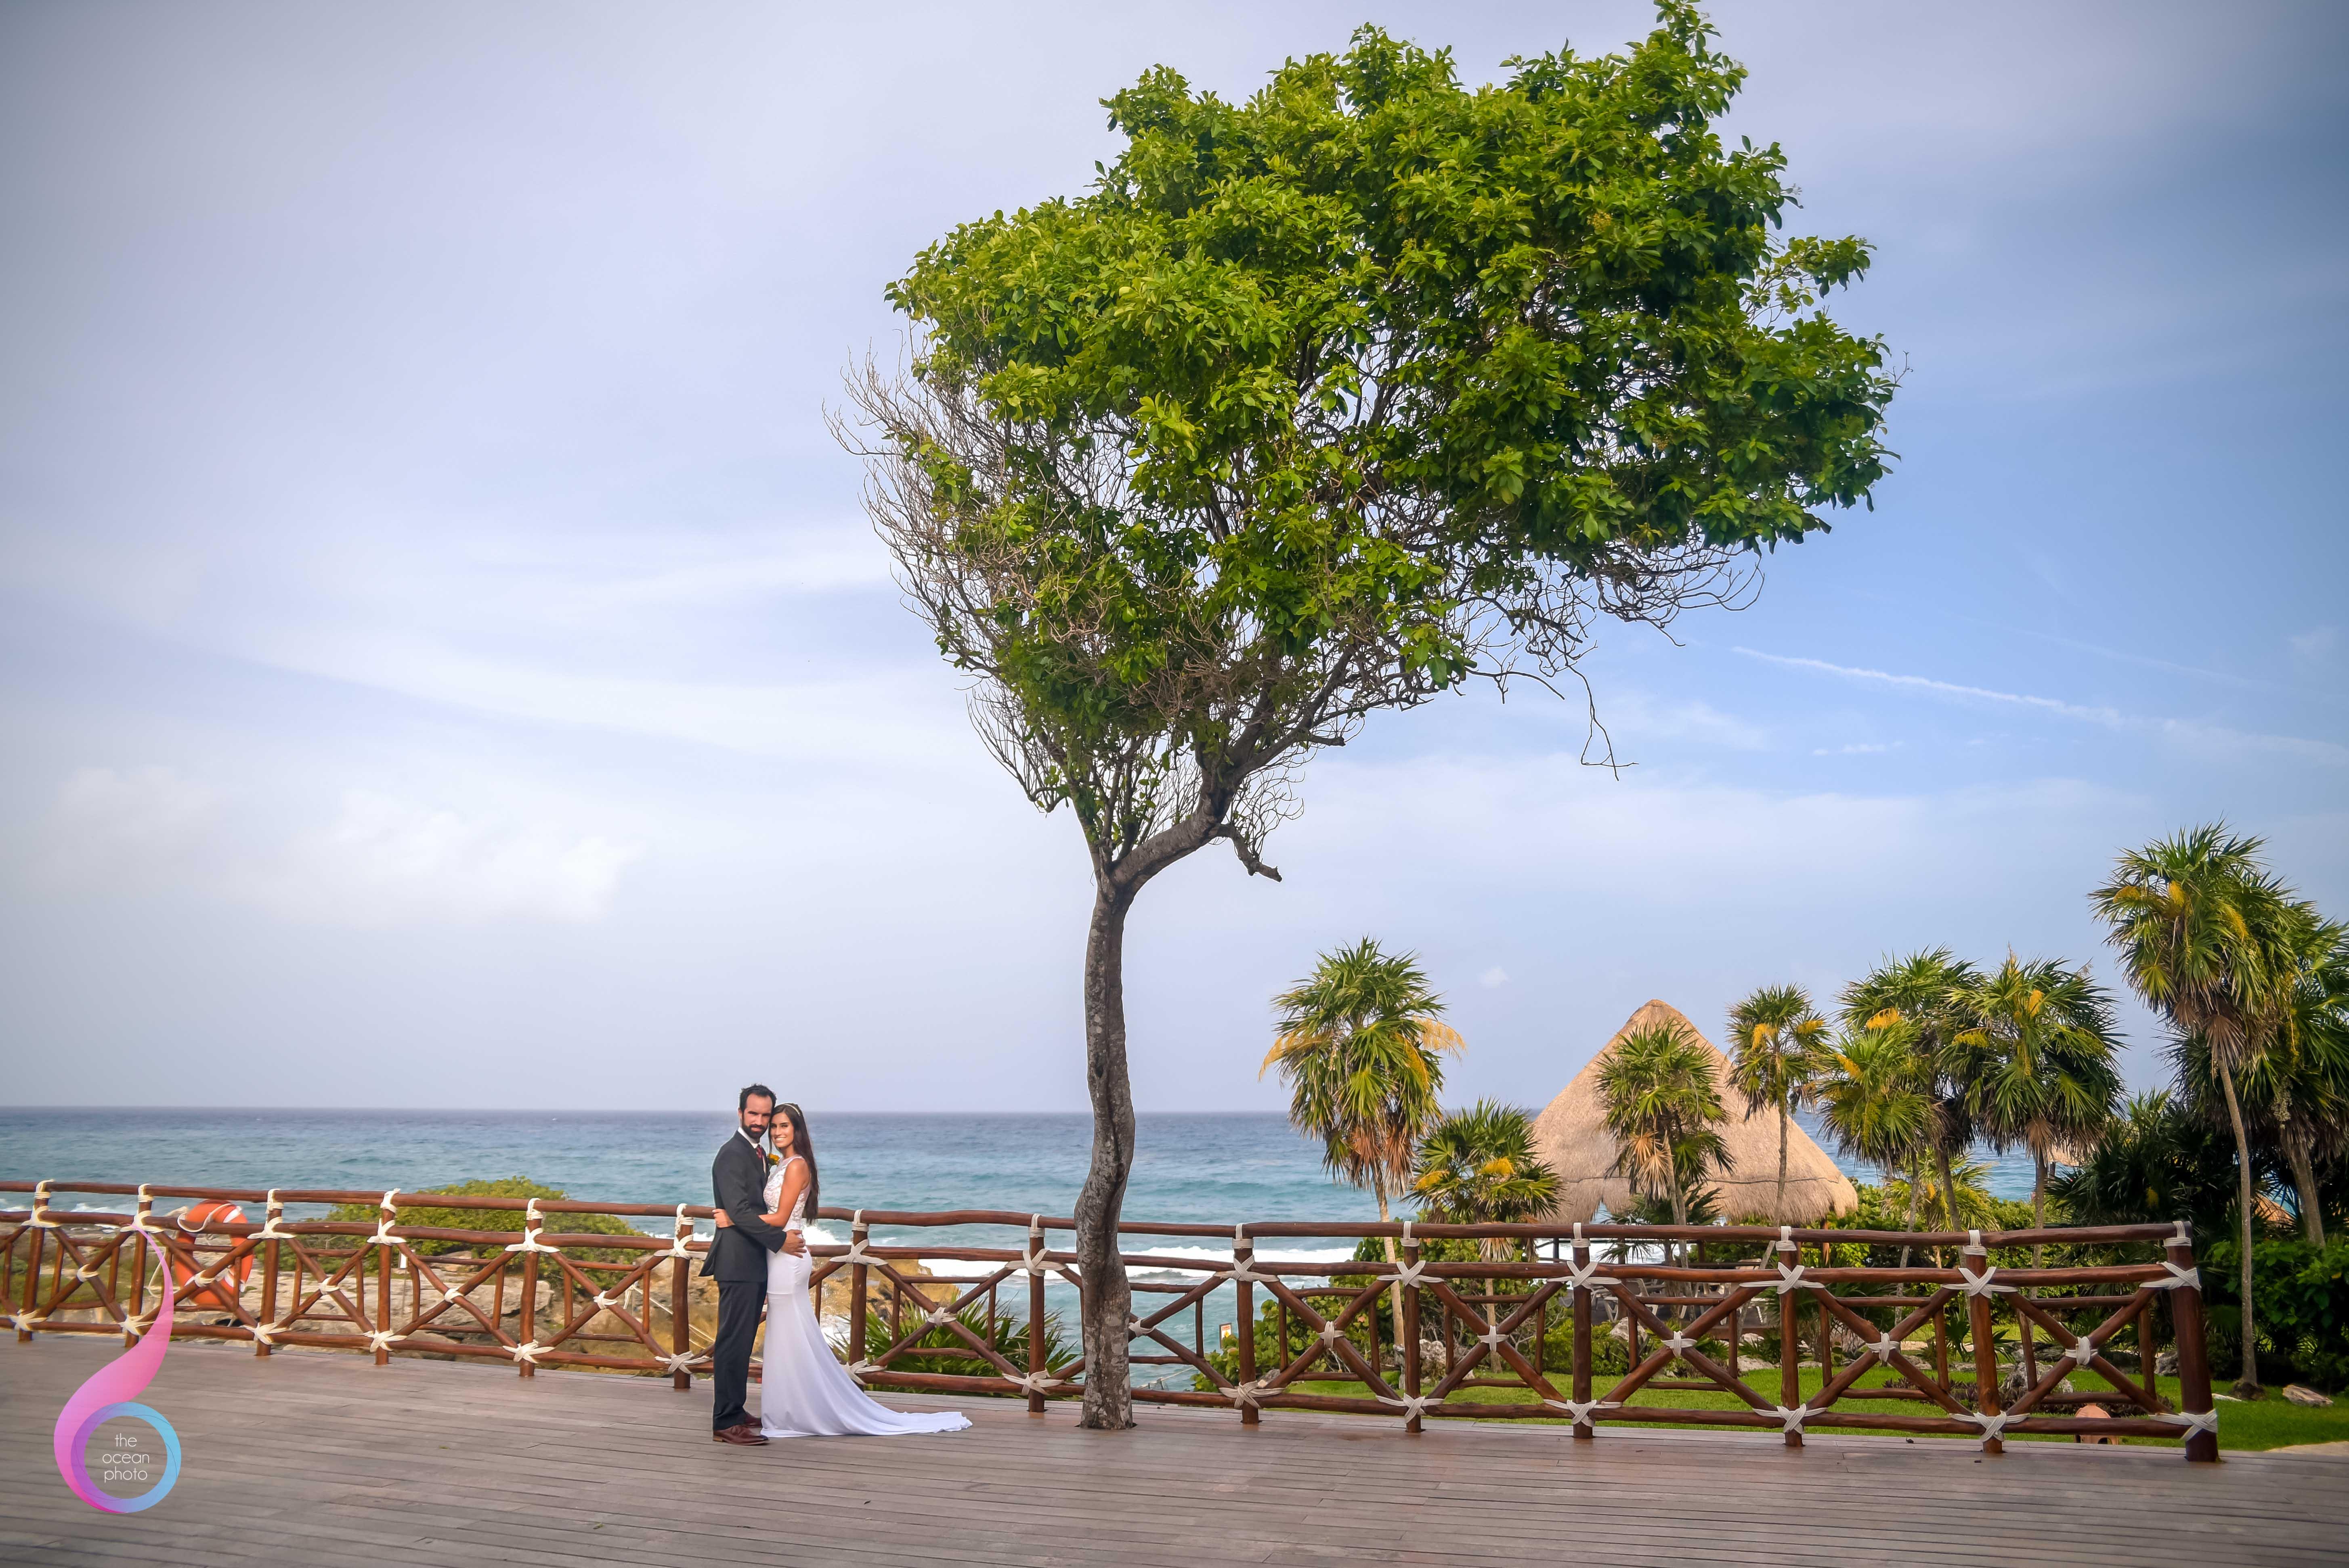 theoceanphotowedding-44